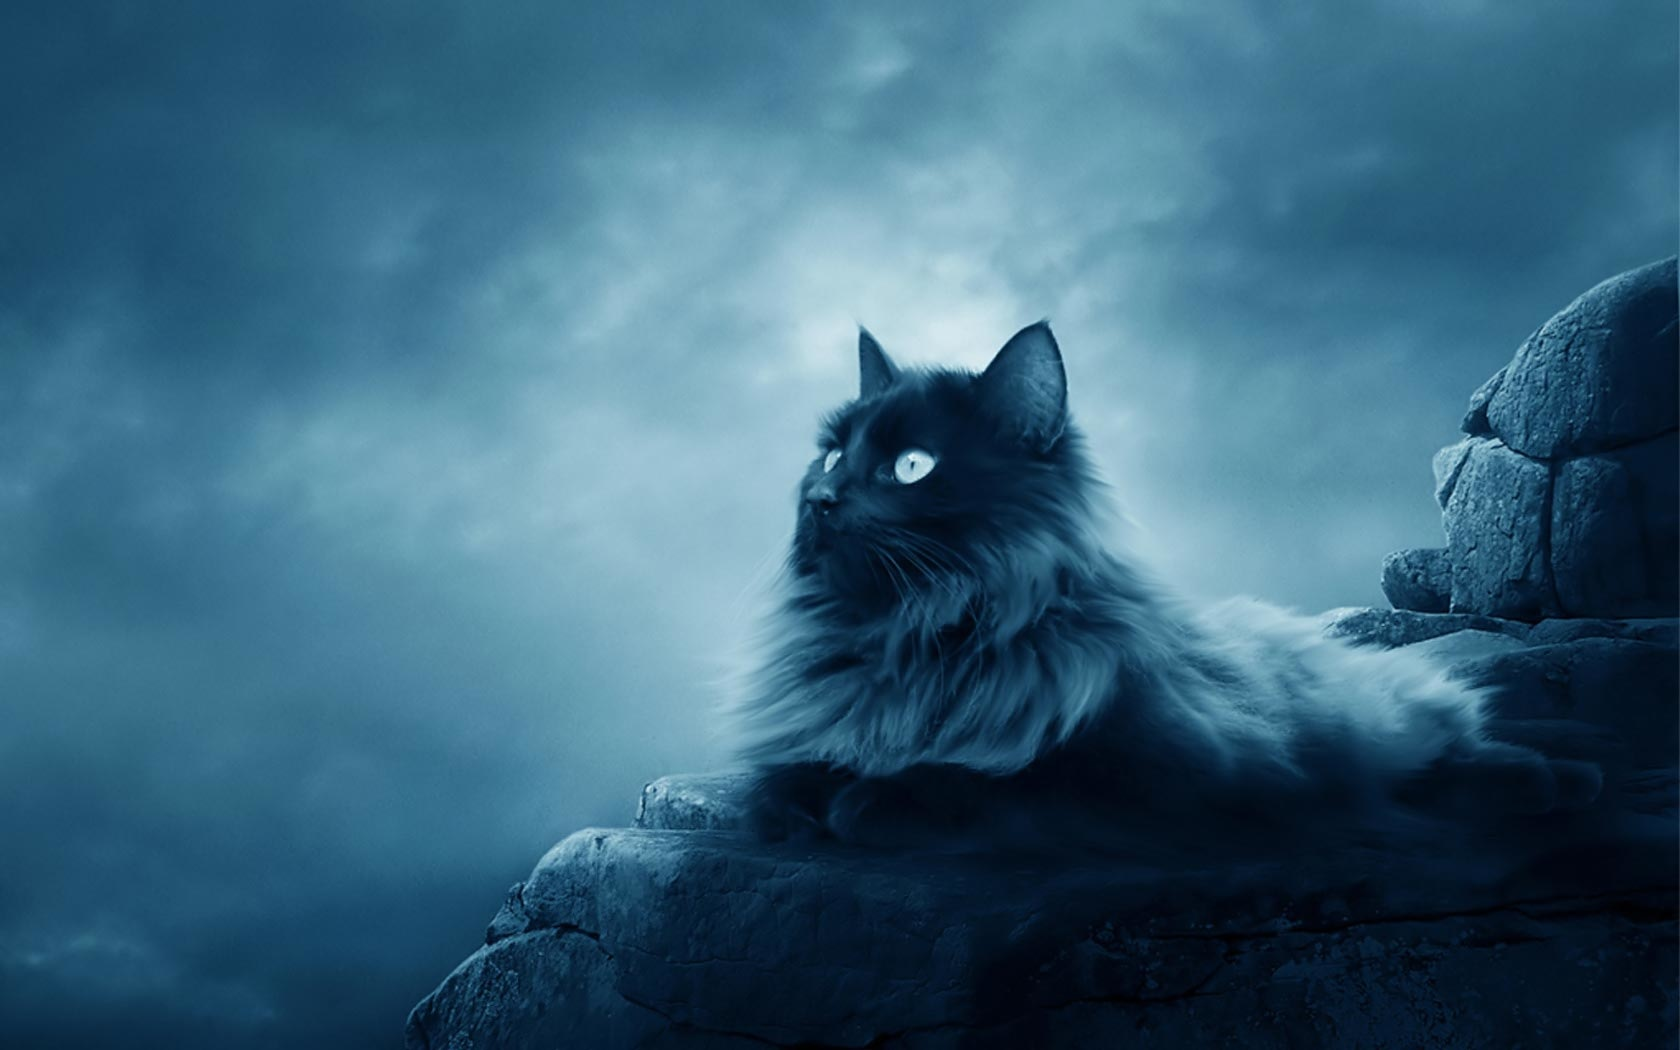 Beautiful Kitty Cats Wallpaper 41197398 Fanpop